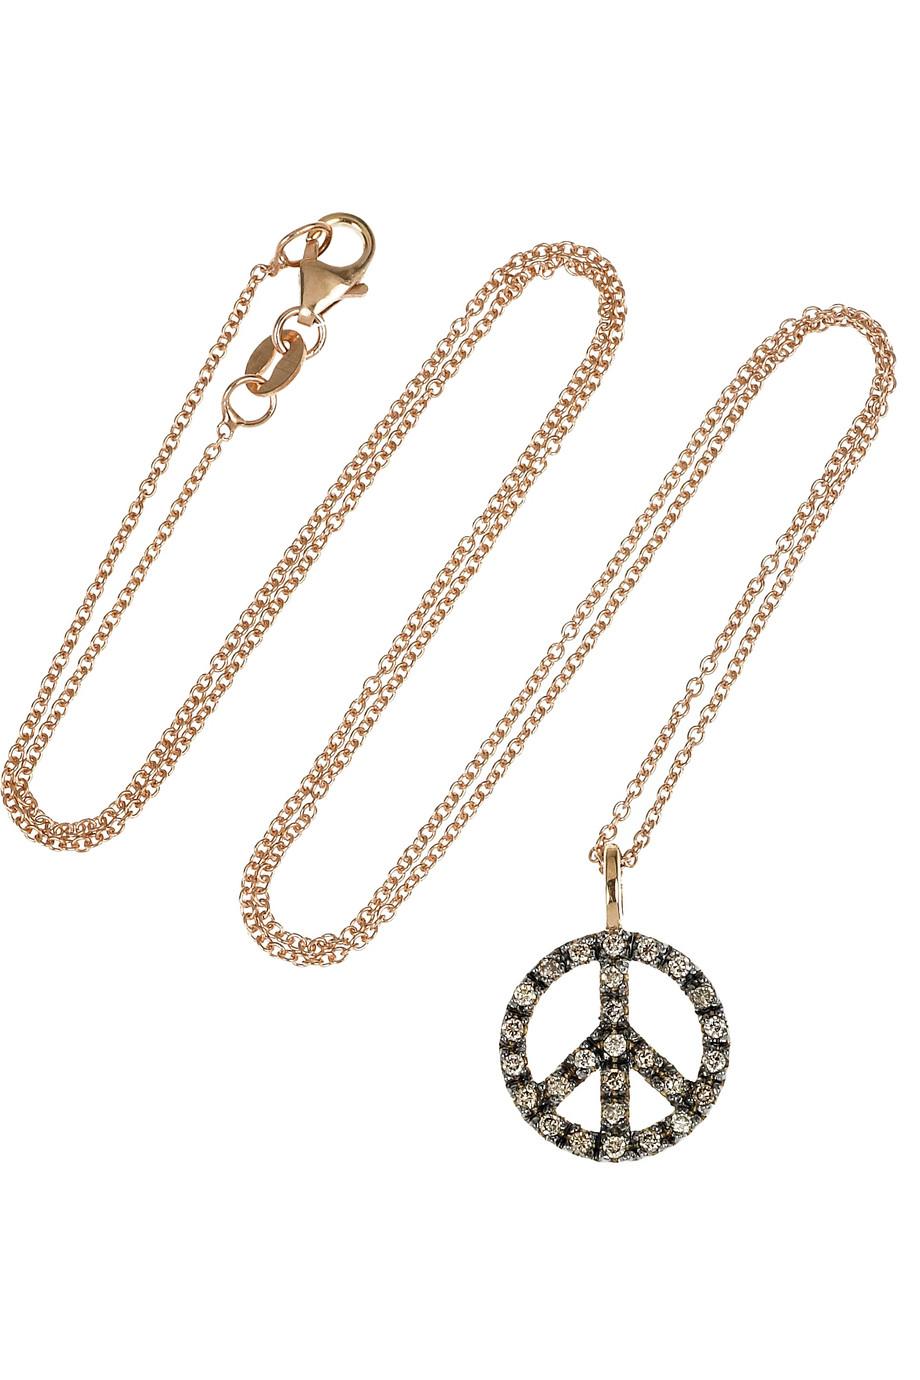 Ileana Makri 18-karat Rose Gold Diamond Necklace 0gJziKI